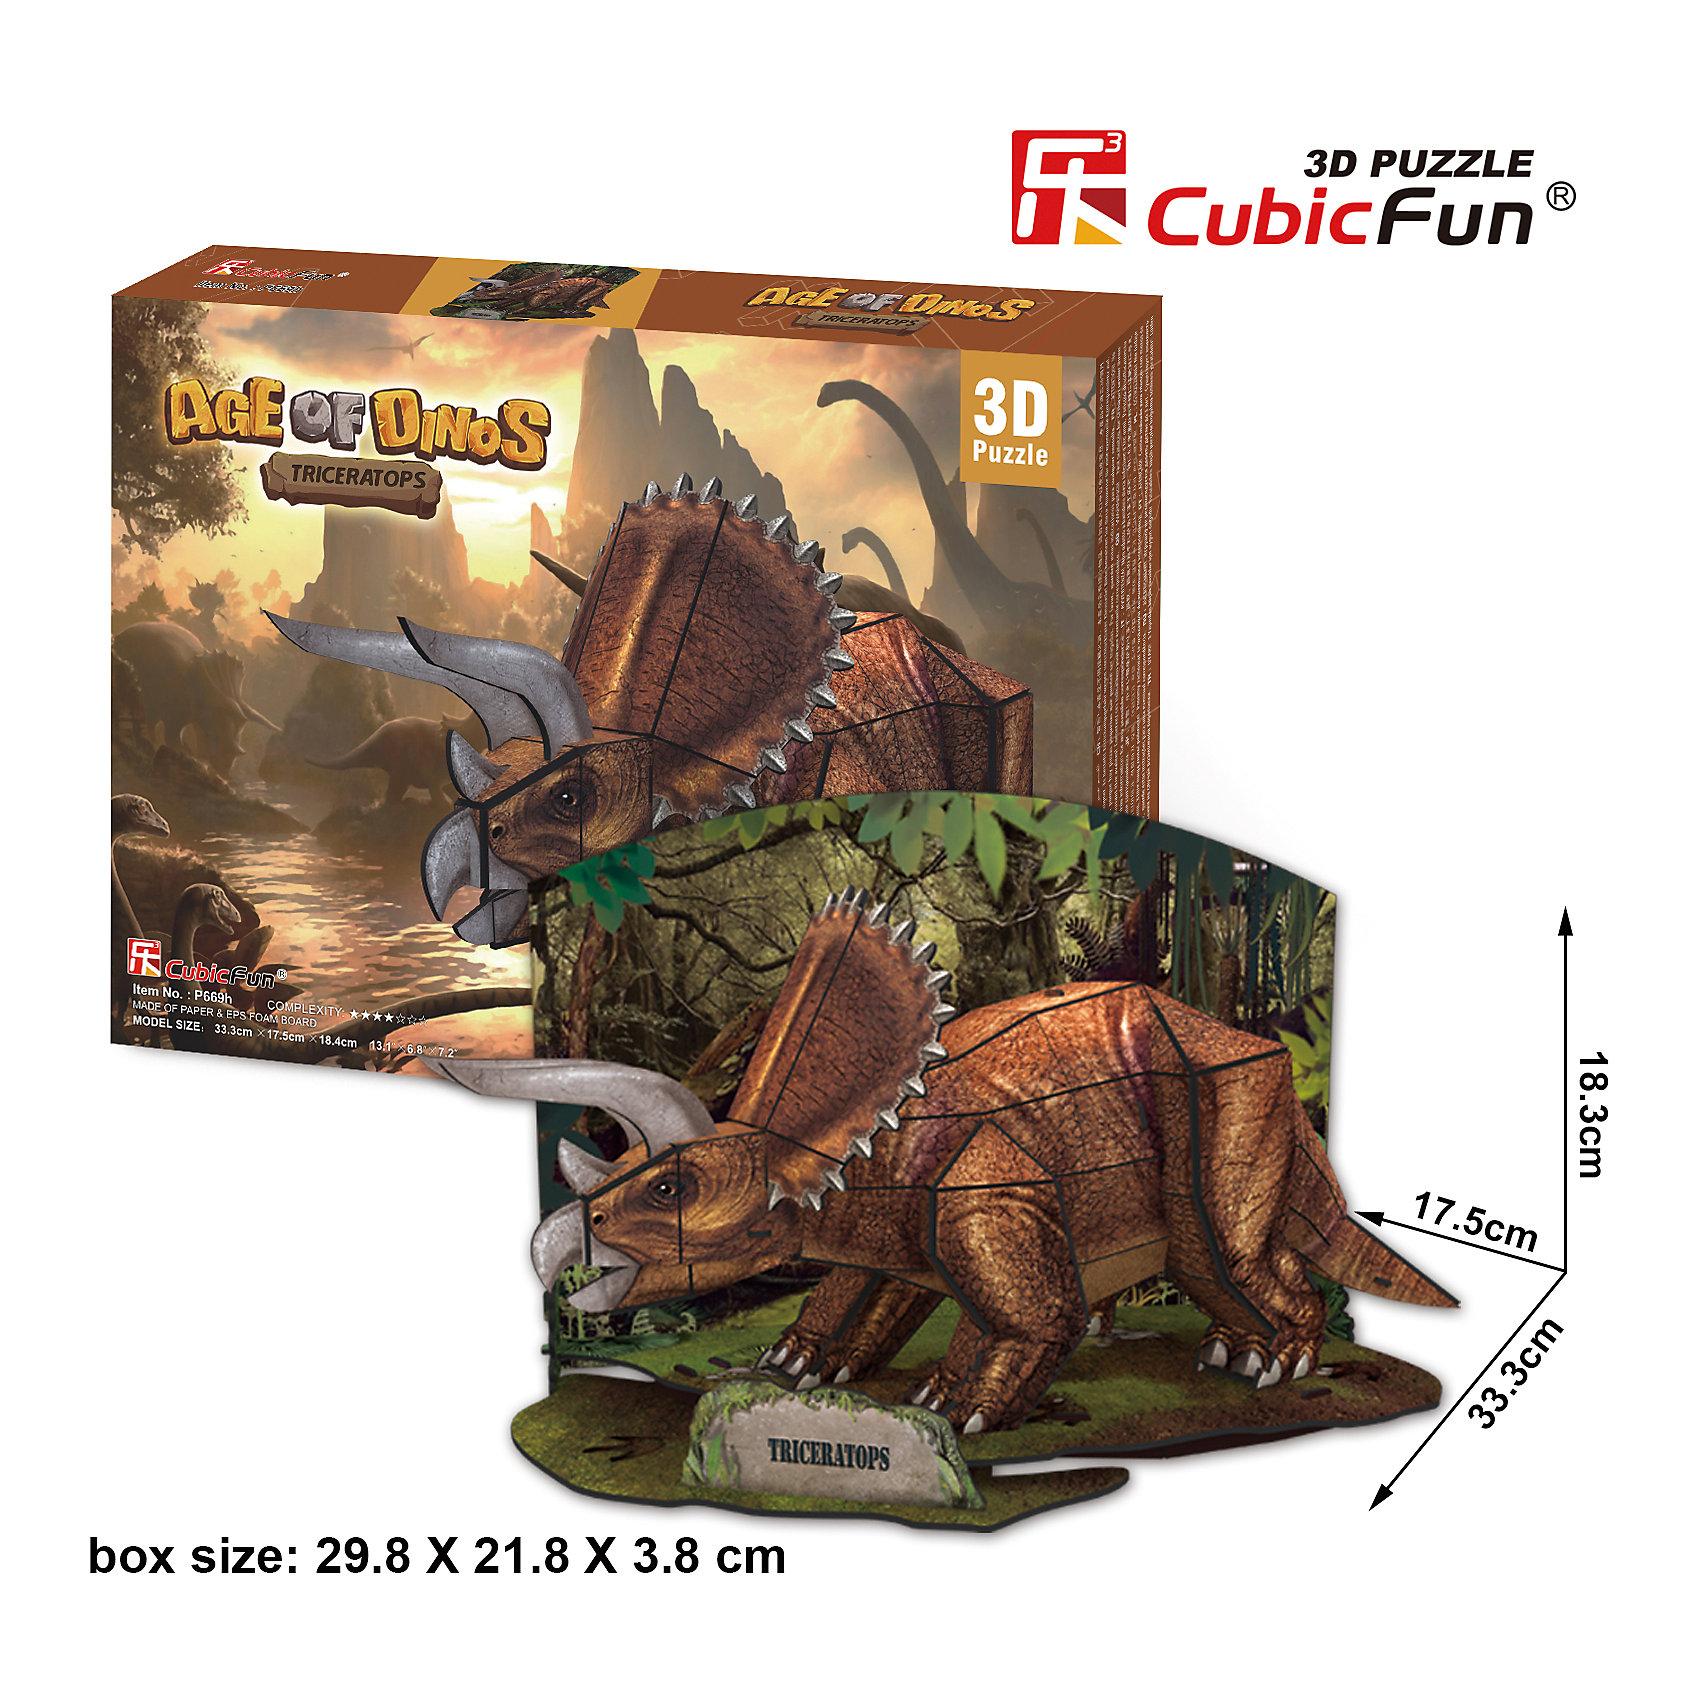 CubicFun Пазл 3D Эра Динозавров Трицератопс, CubicFun cubicfun 3d пазл эйфелева башня 2 франция cubicfun 33 детали